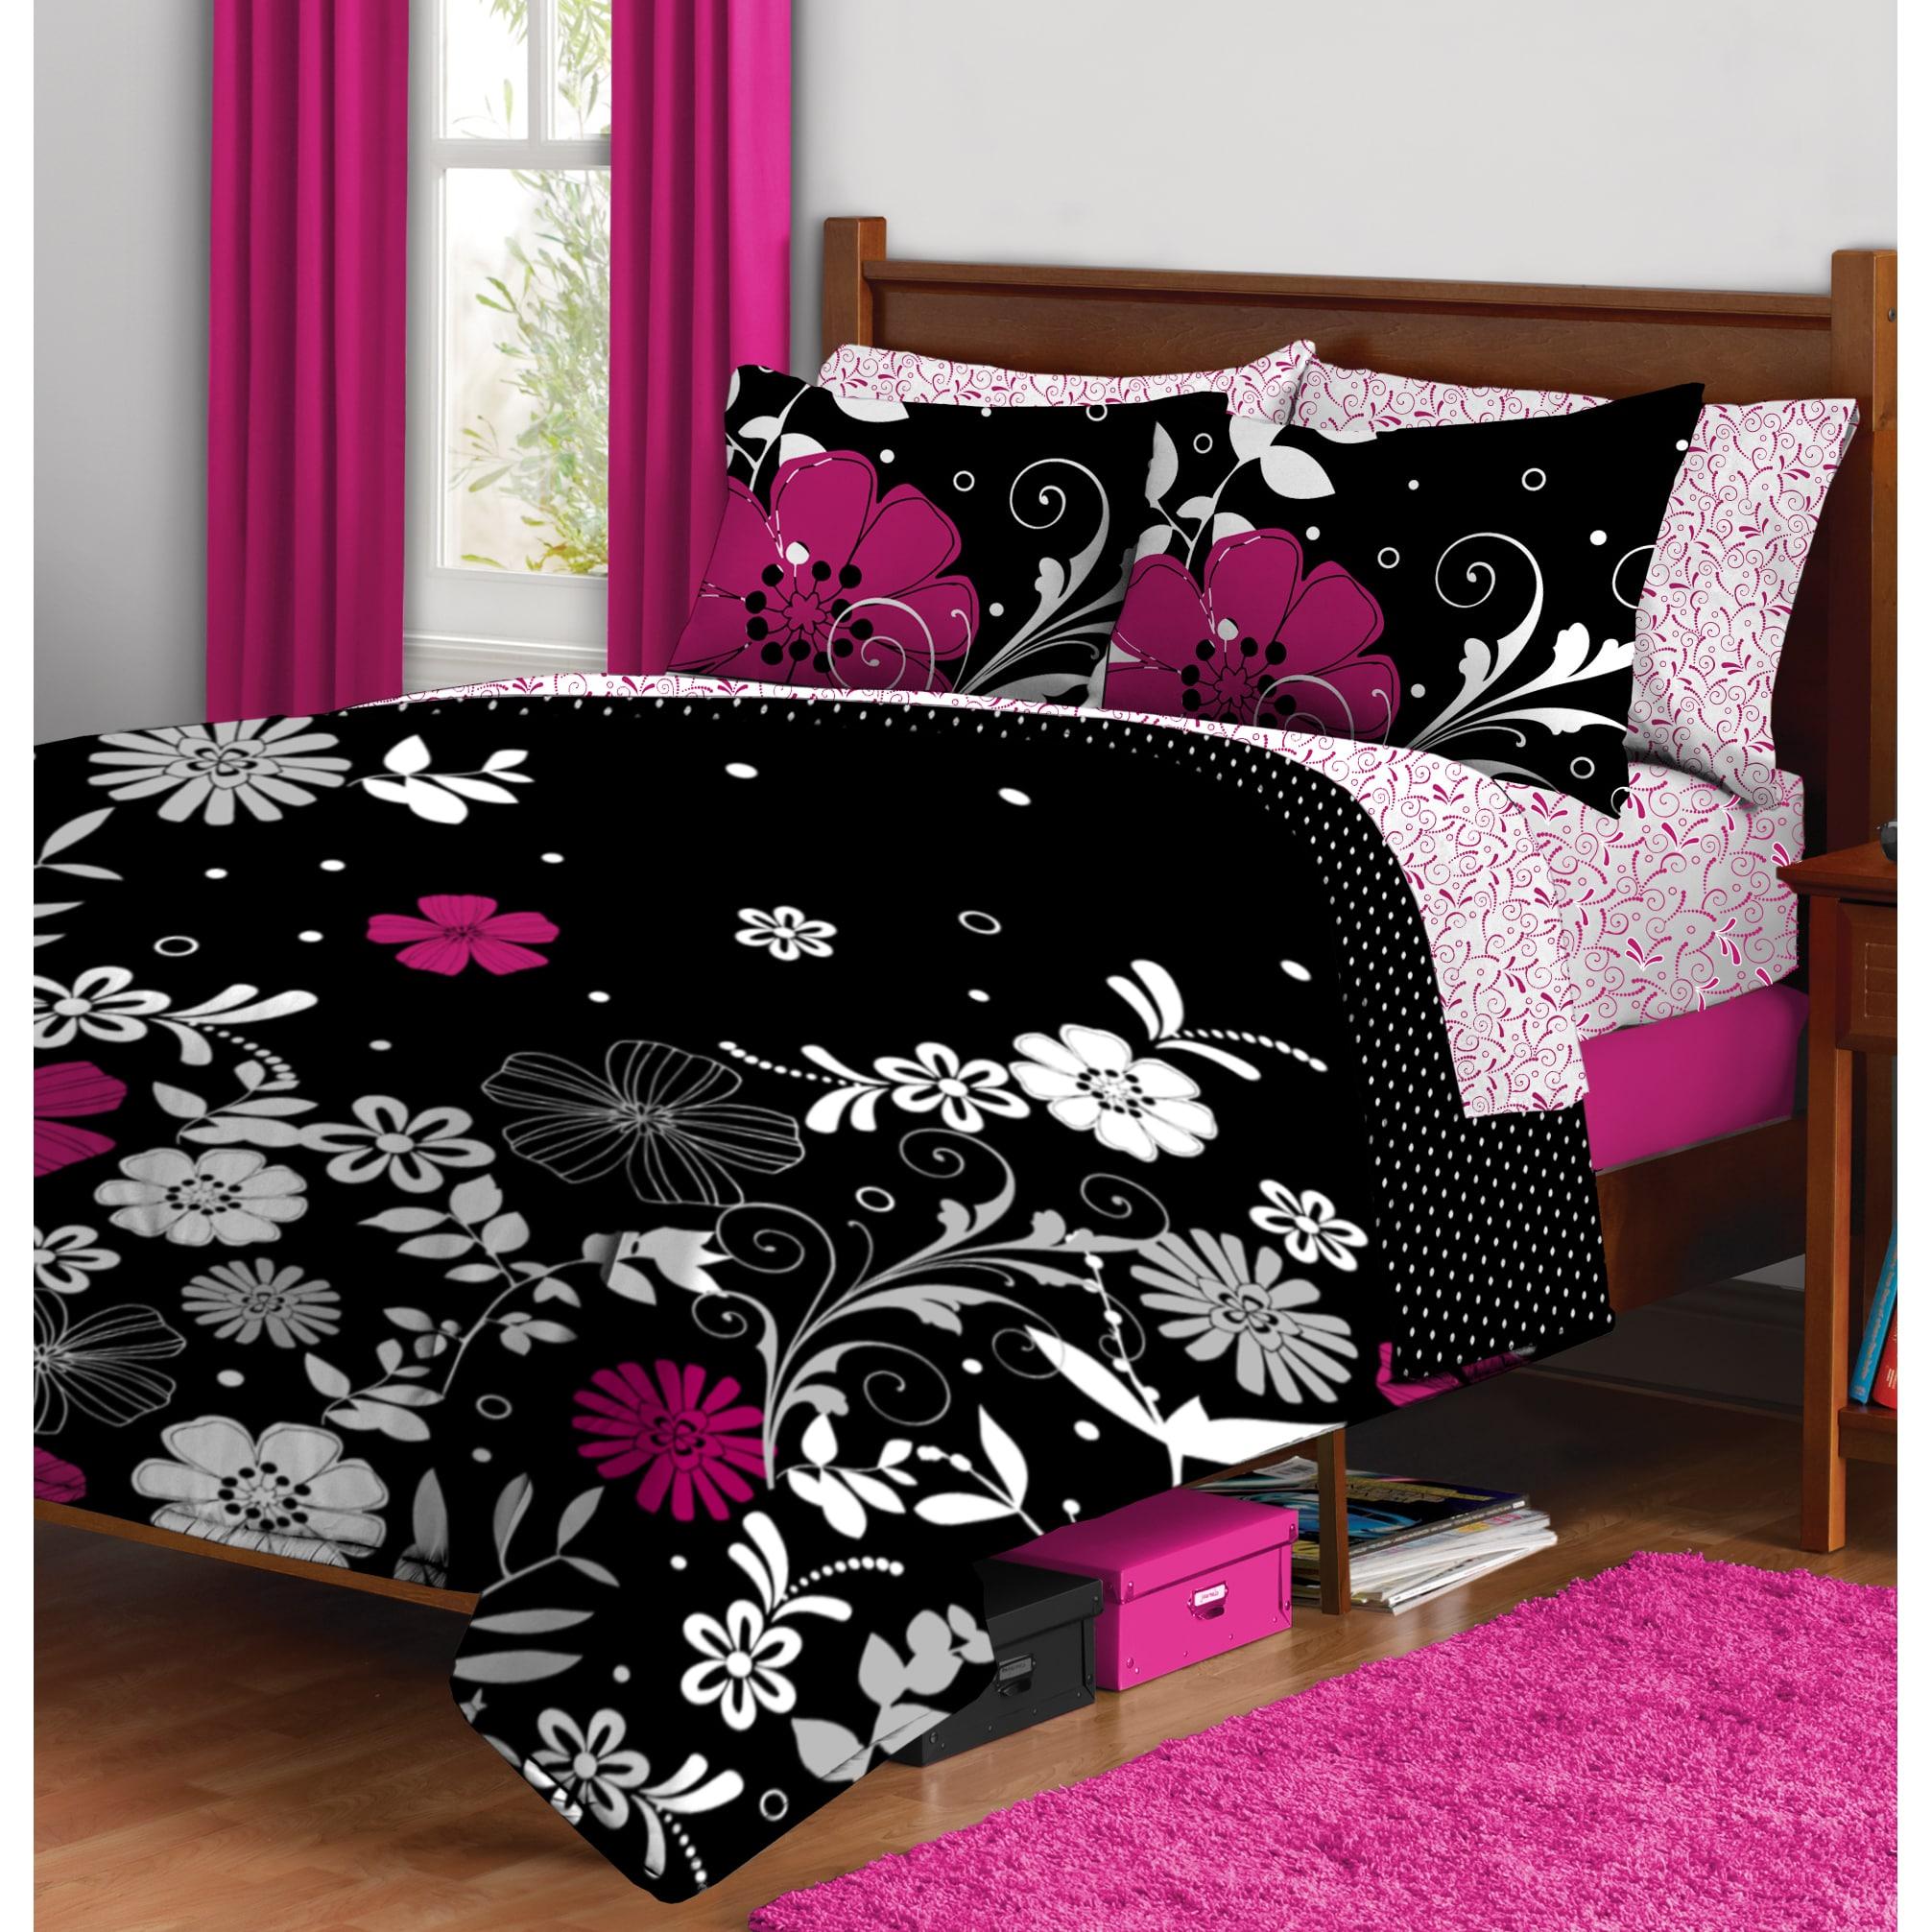 Idea Nuova Formula Twilight Garden 7-piece Bed in a Bag with Sheet Set